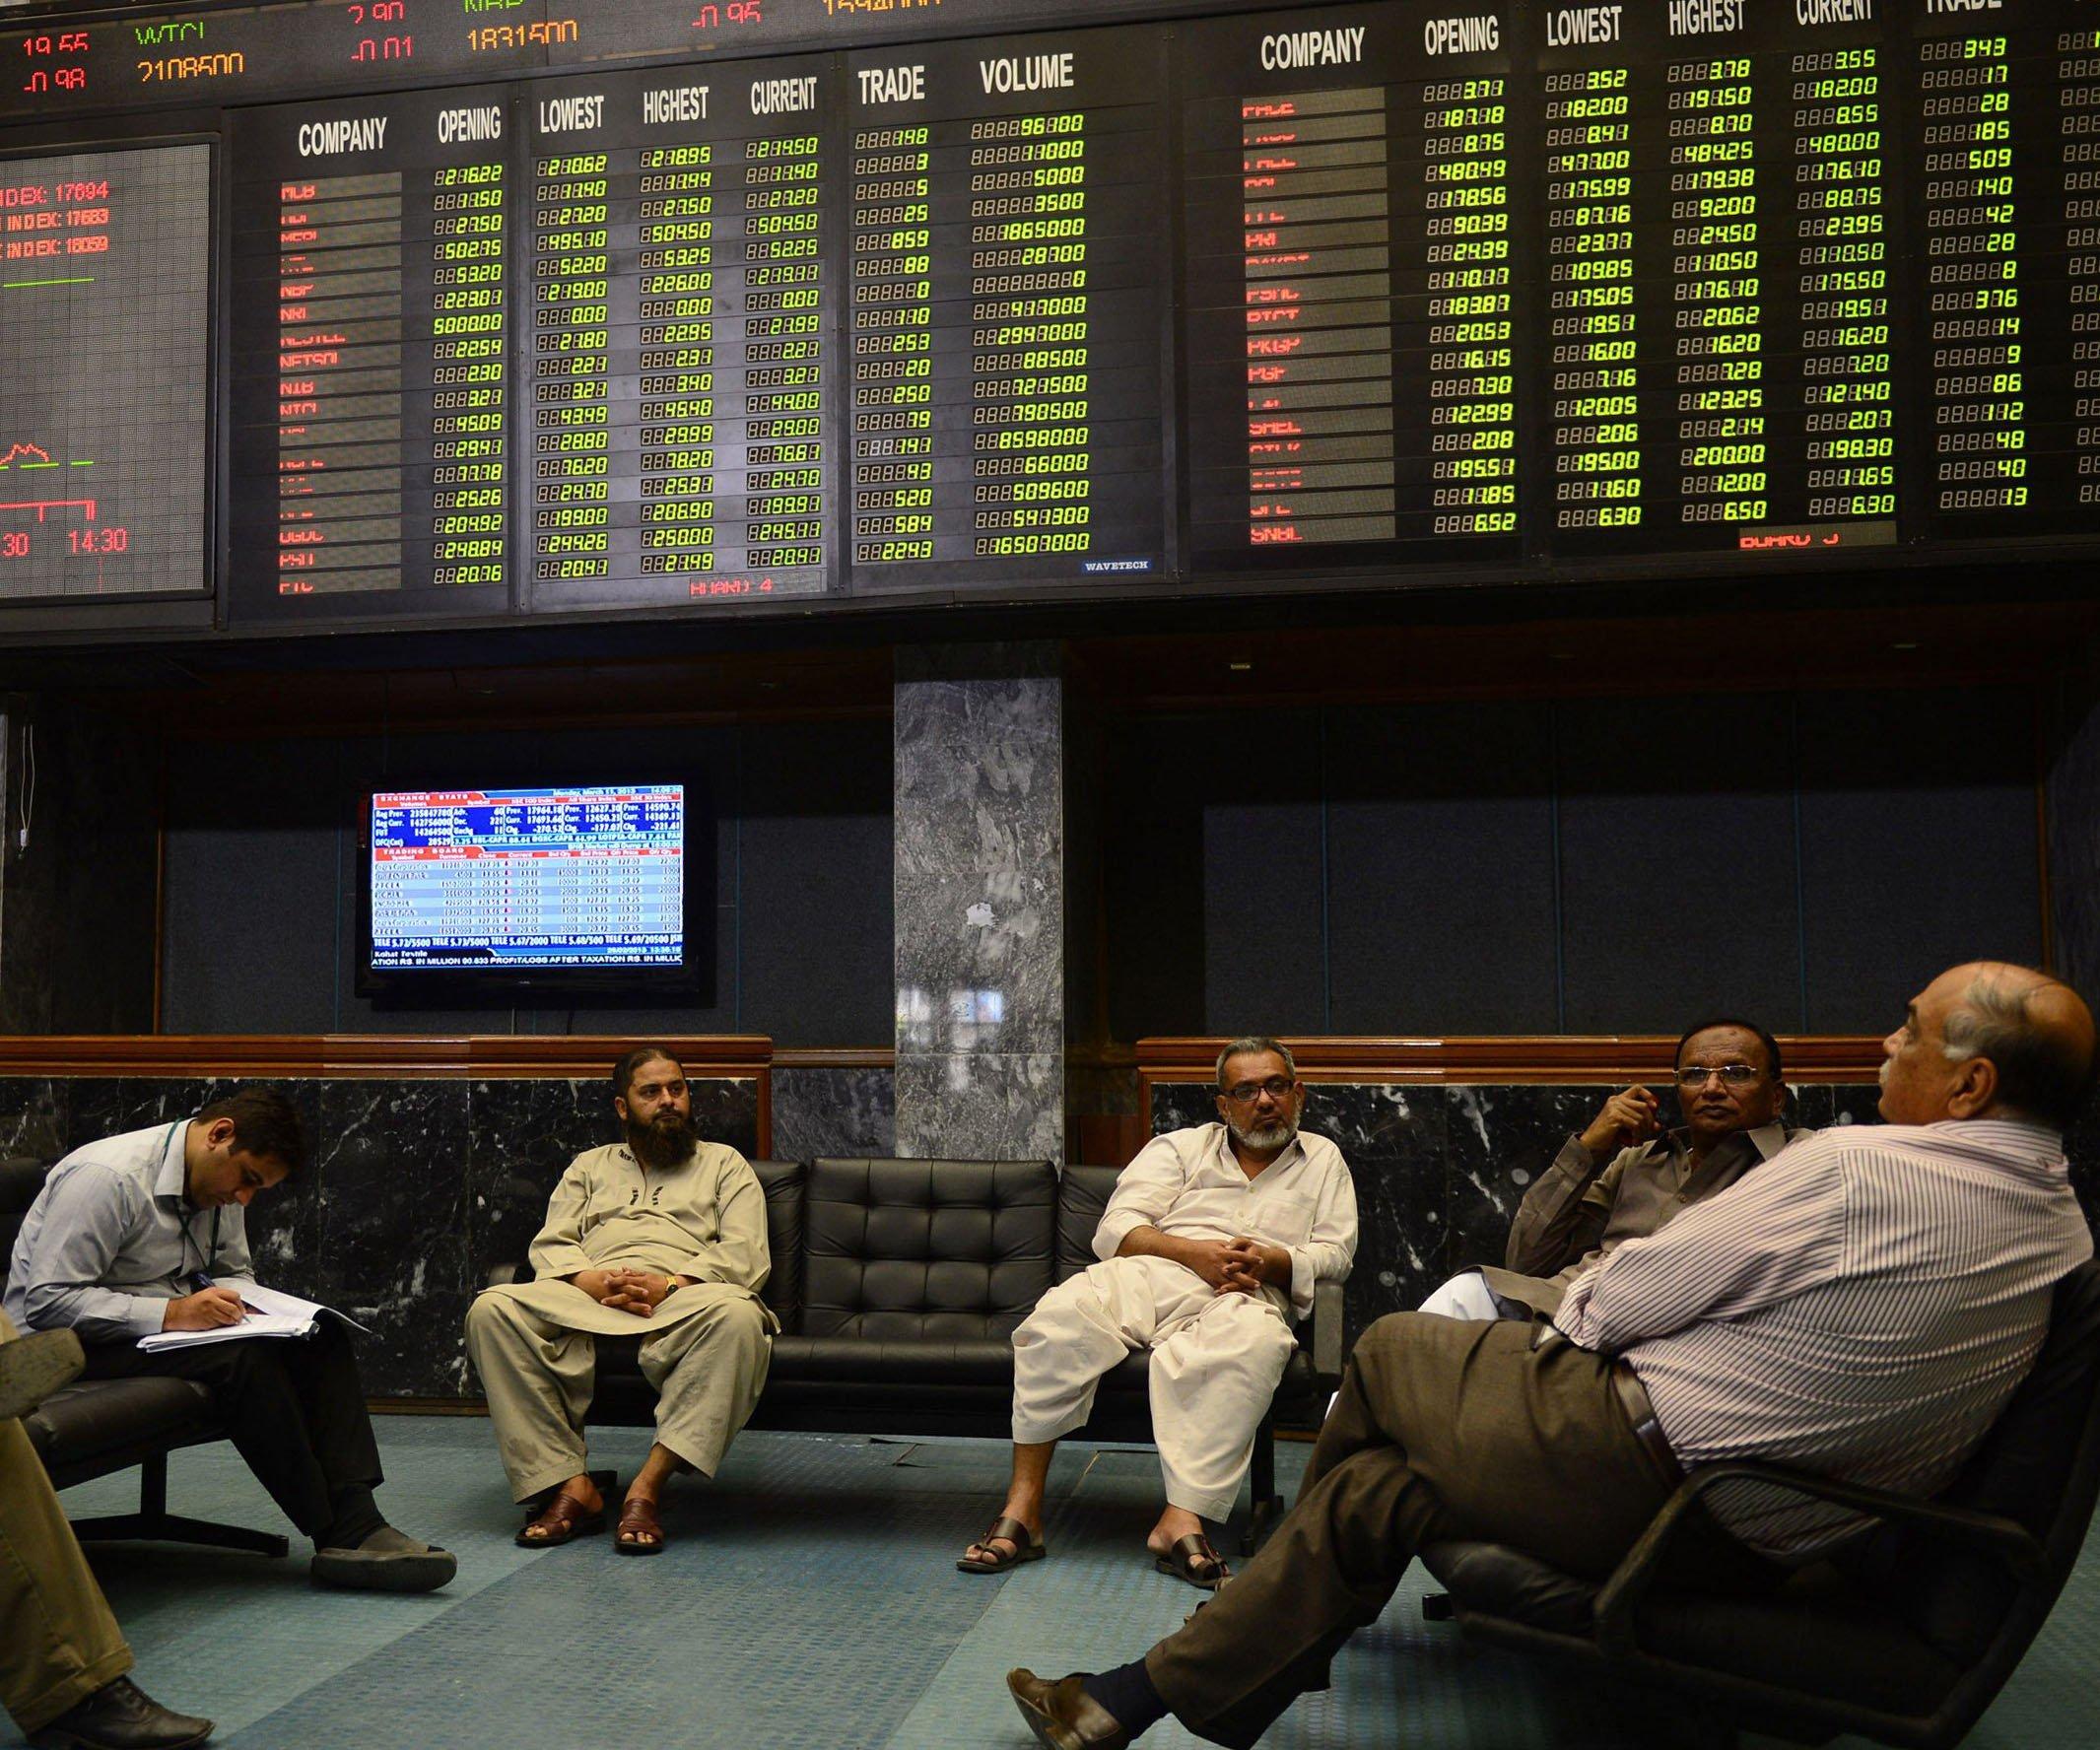 market watch karachi package helps lift stock market